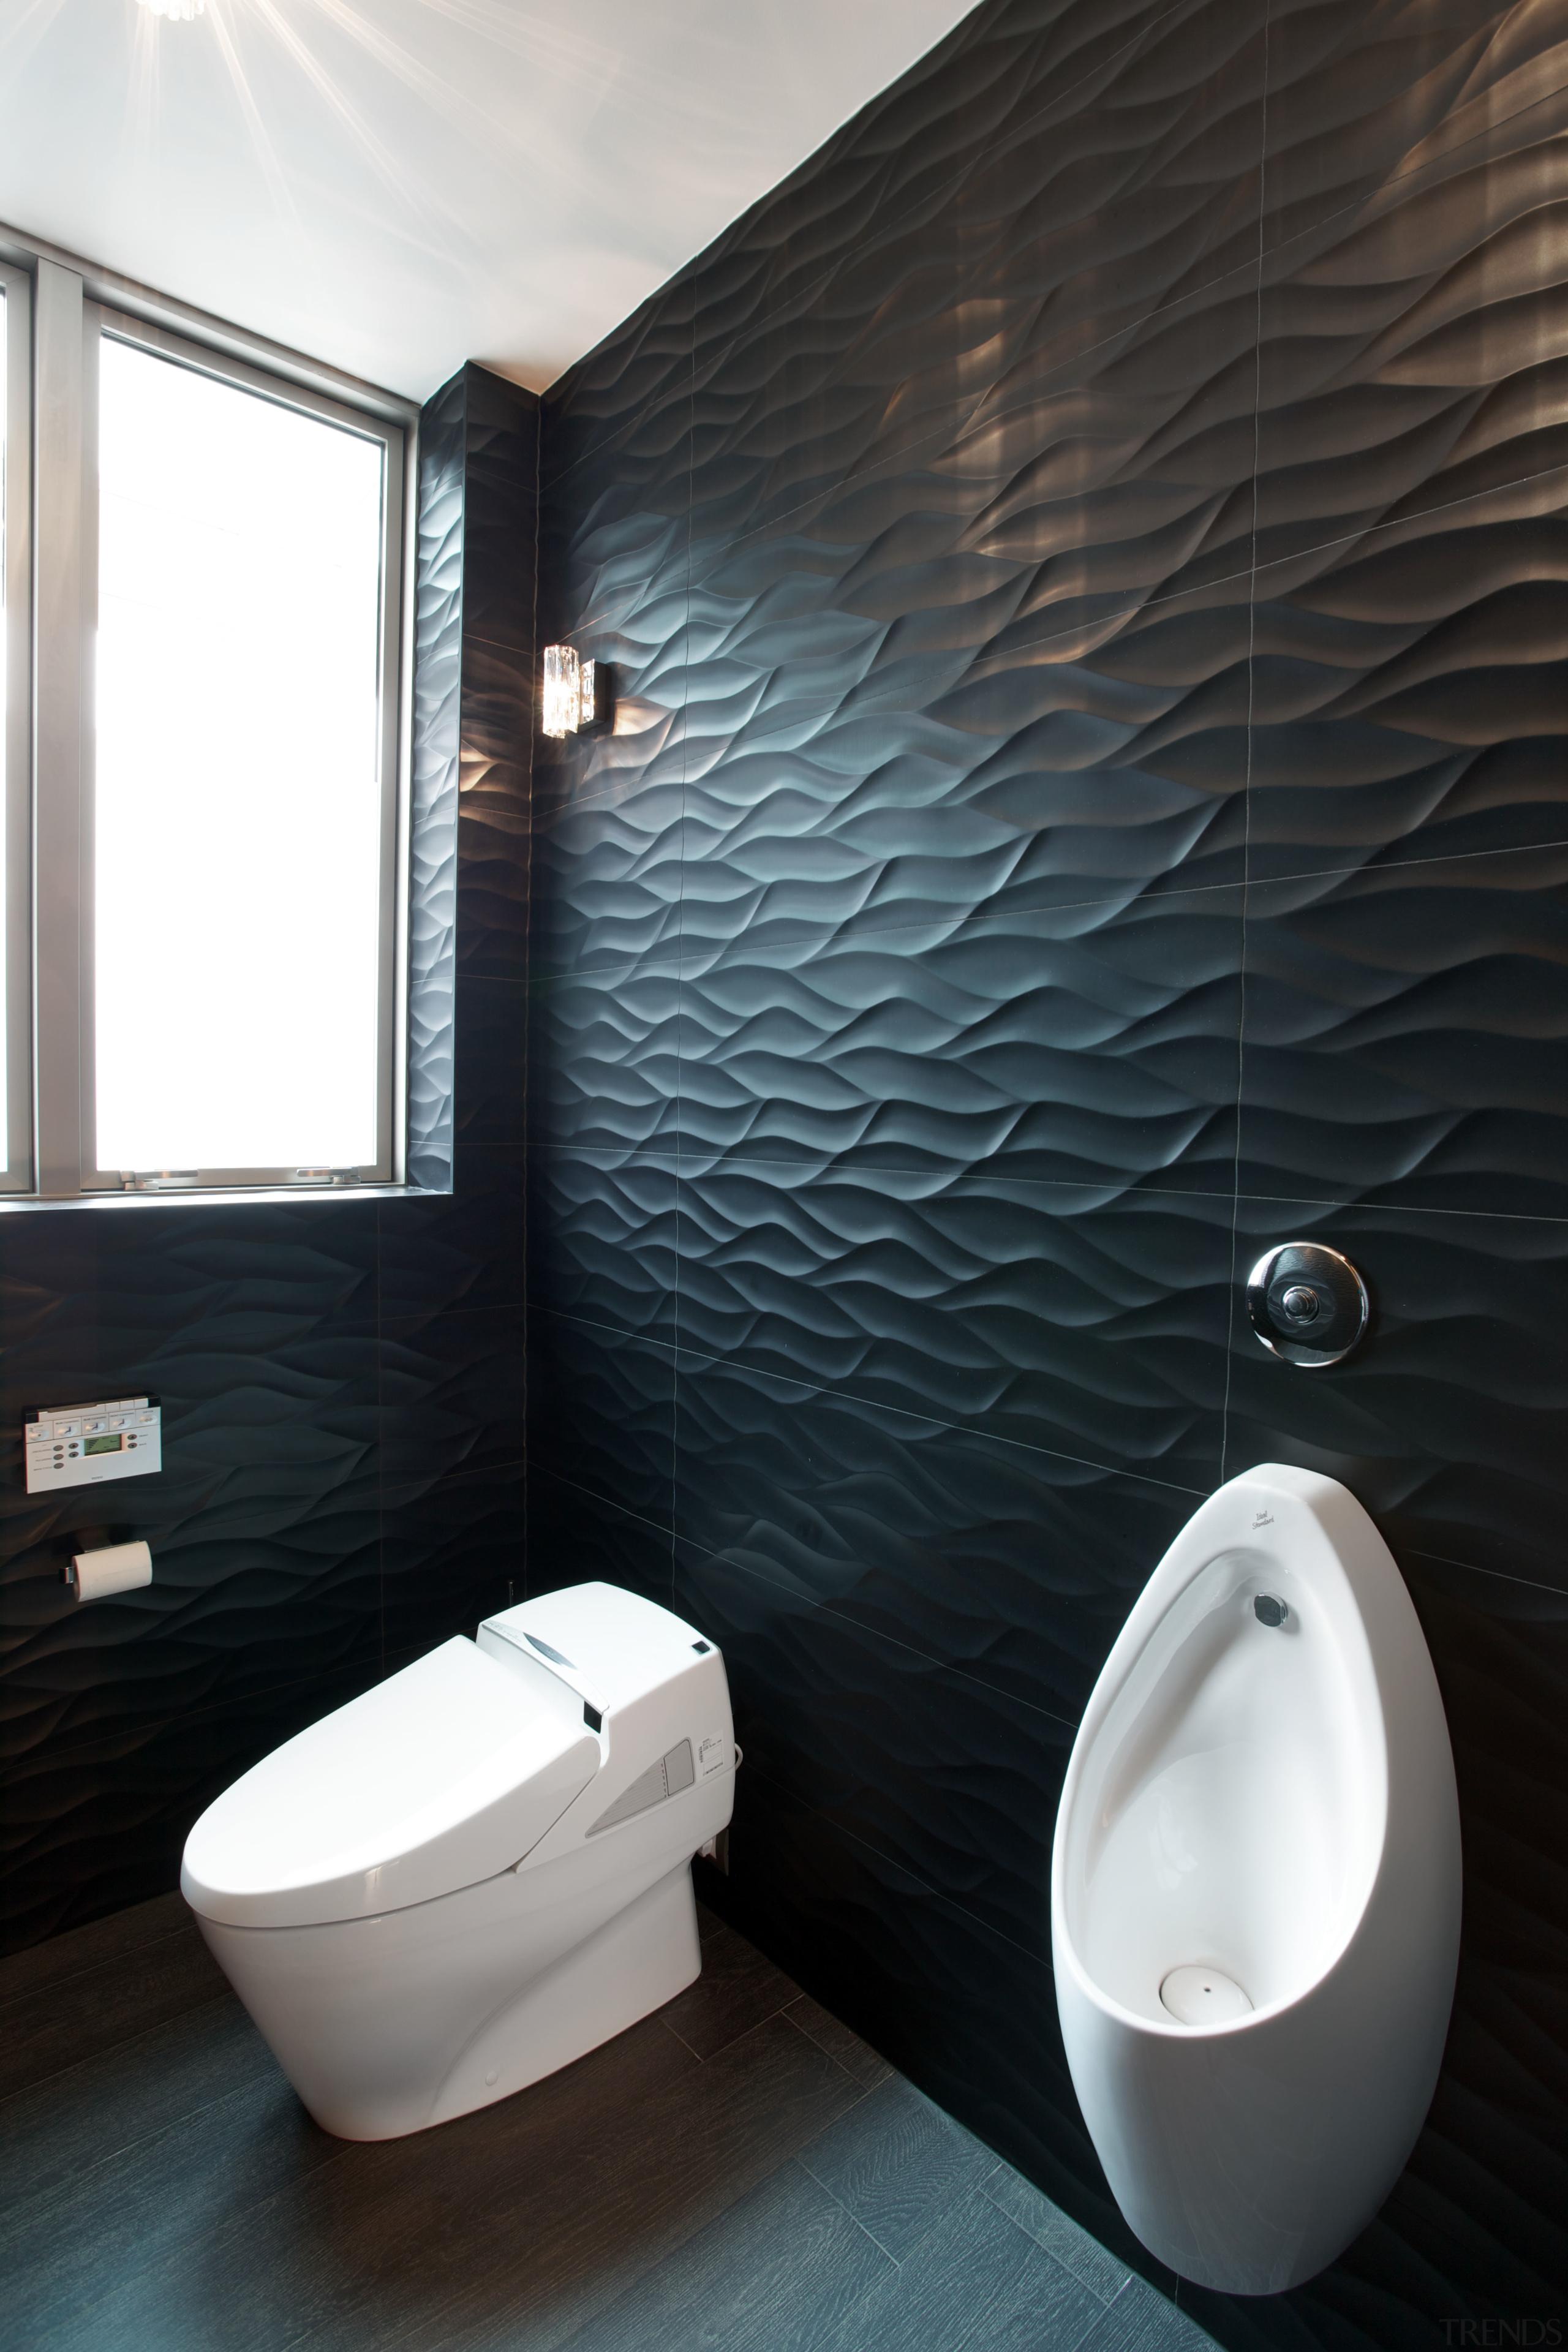 The wall tiles lining the toilet area in bathroom, bidet, ceramic, floor, interior design, plumbing fixture, product design, room, tap, toilet, toilet seat, black